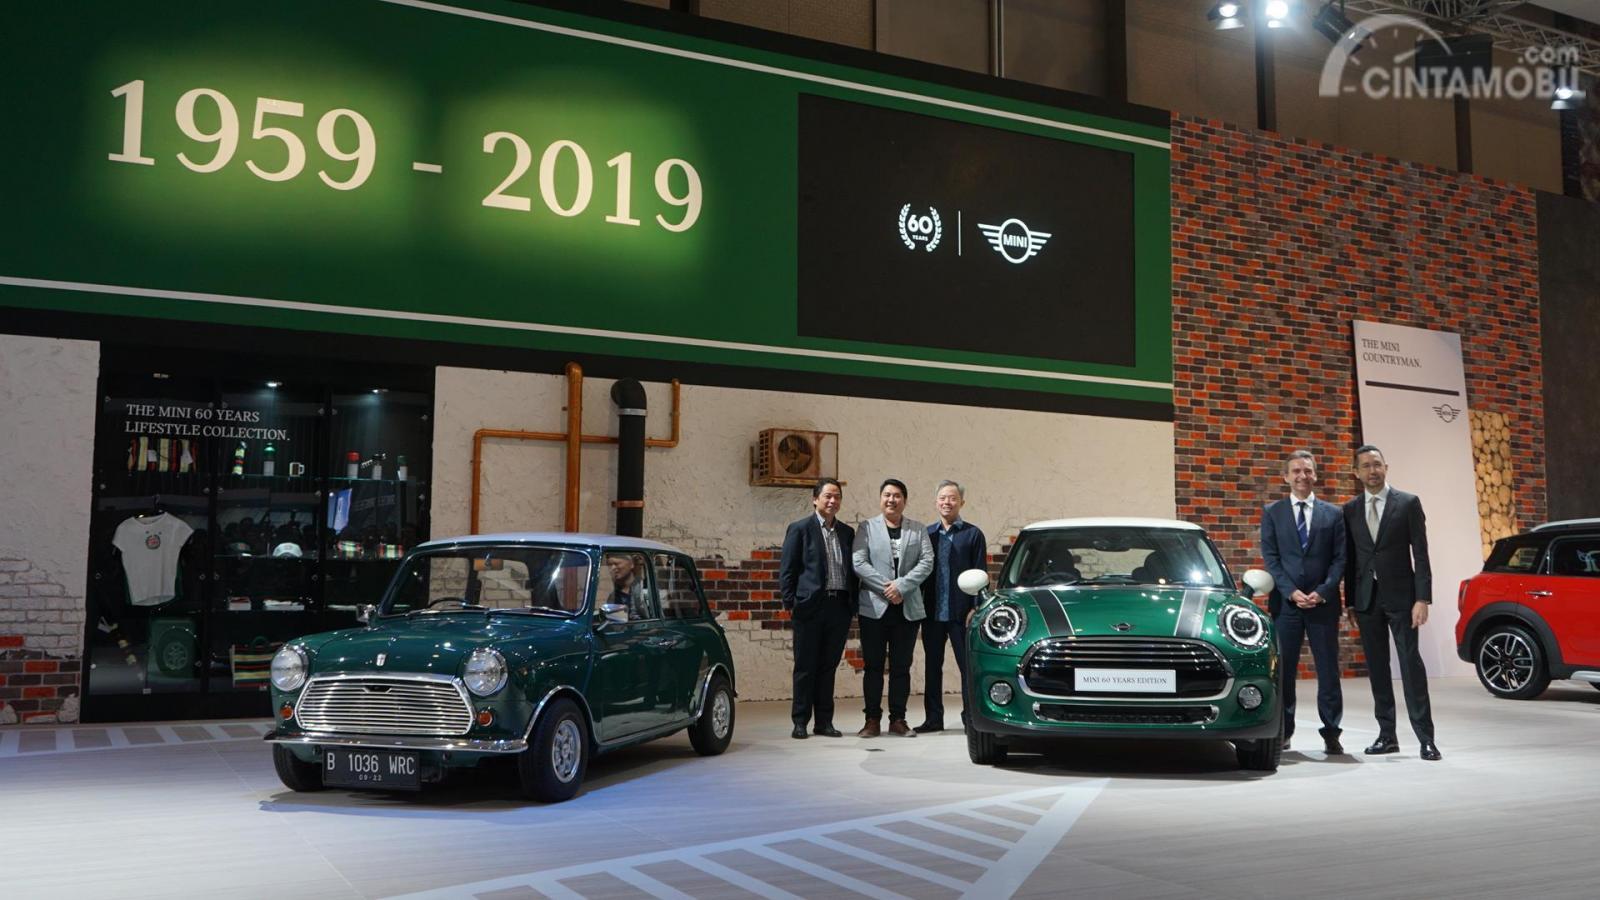 peluncuran MINI 60 Years Edition 2019 berwarna hijau di GIIAS 2019